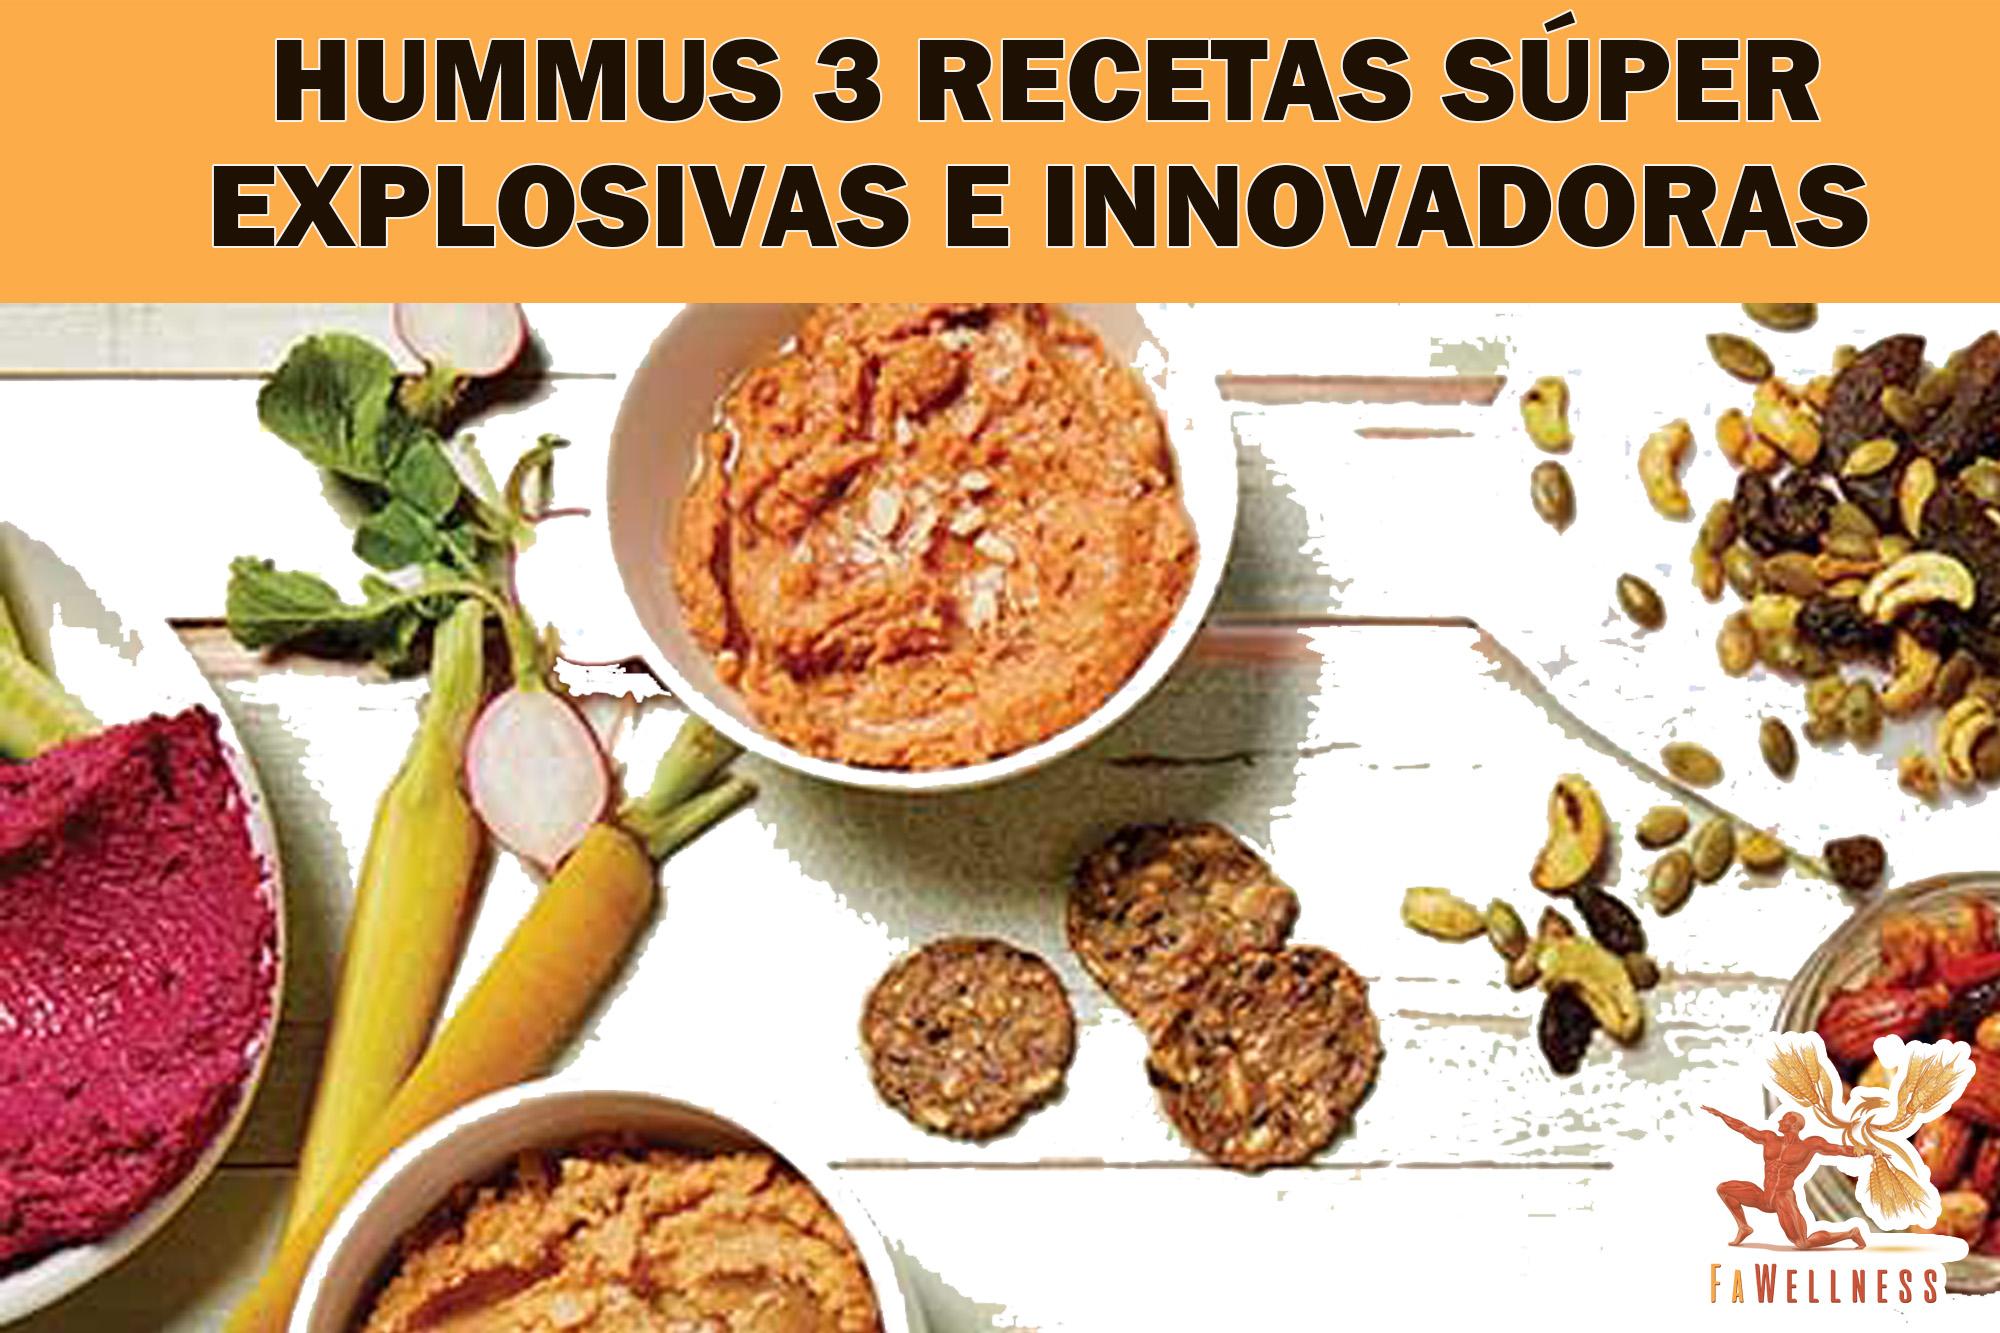 imagen blog FaWellness   HUMMUS  3 Recetas SÚPER EXPLOSIVAS E INNOVADORAS